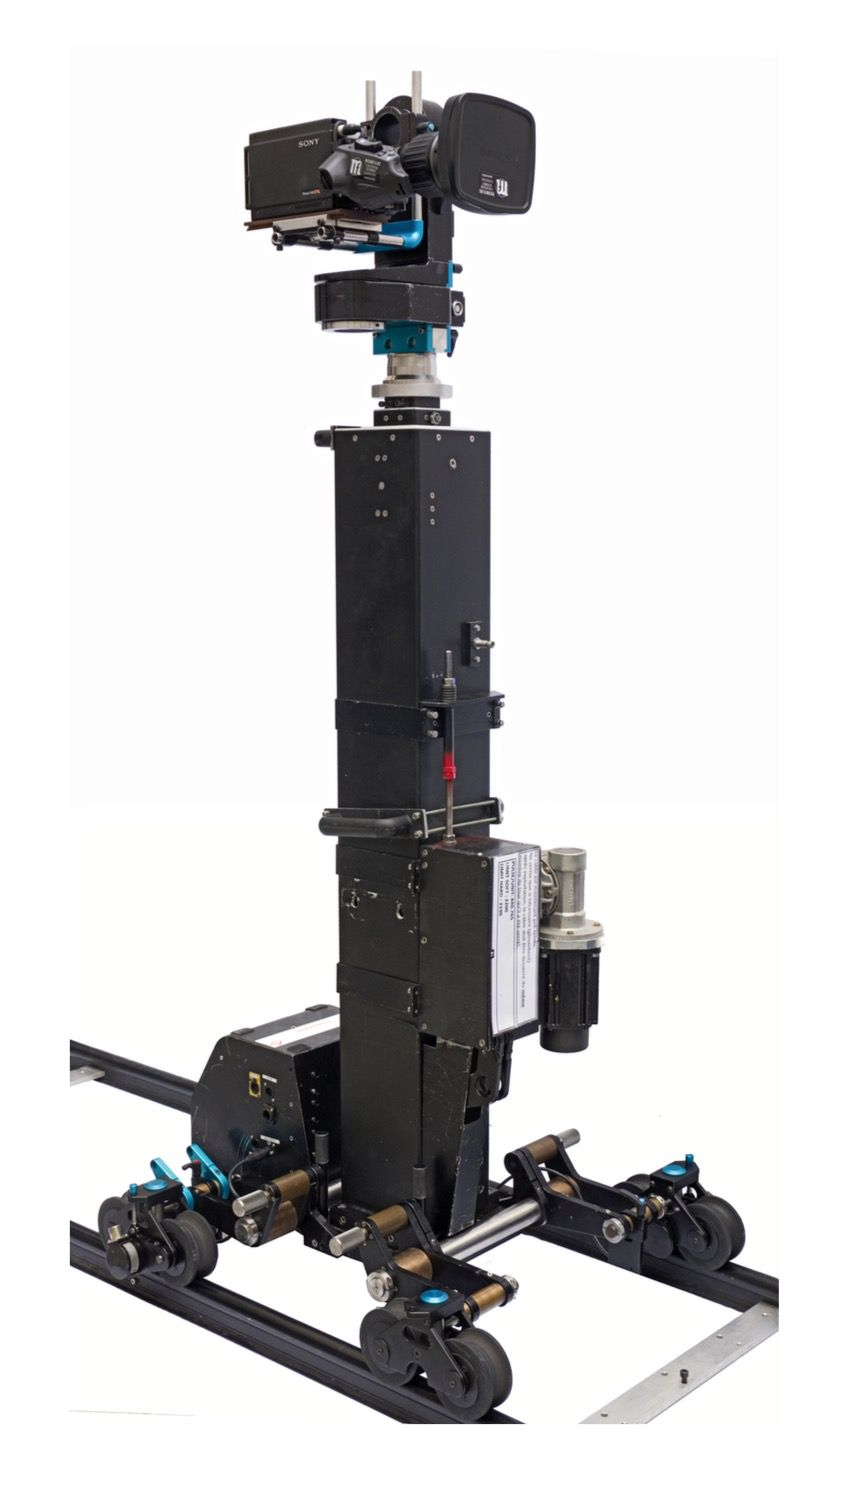 MAT Towercam